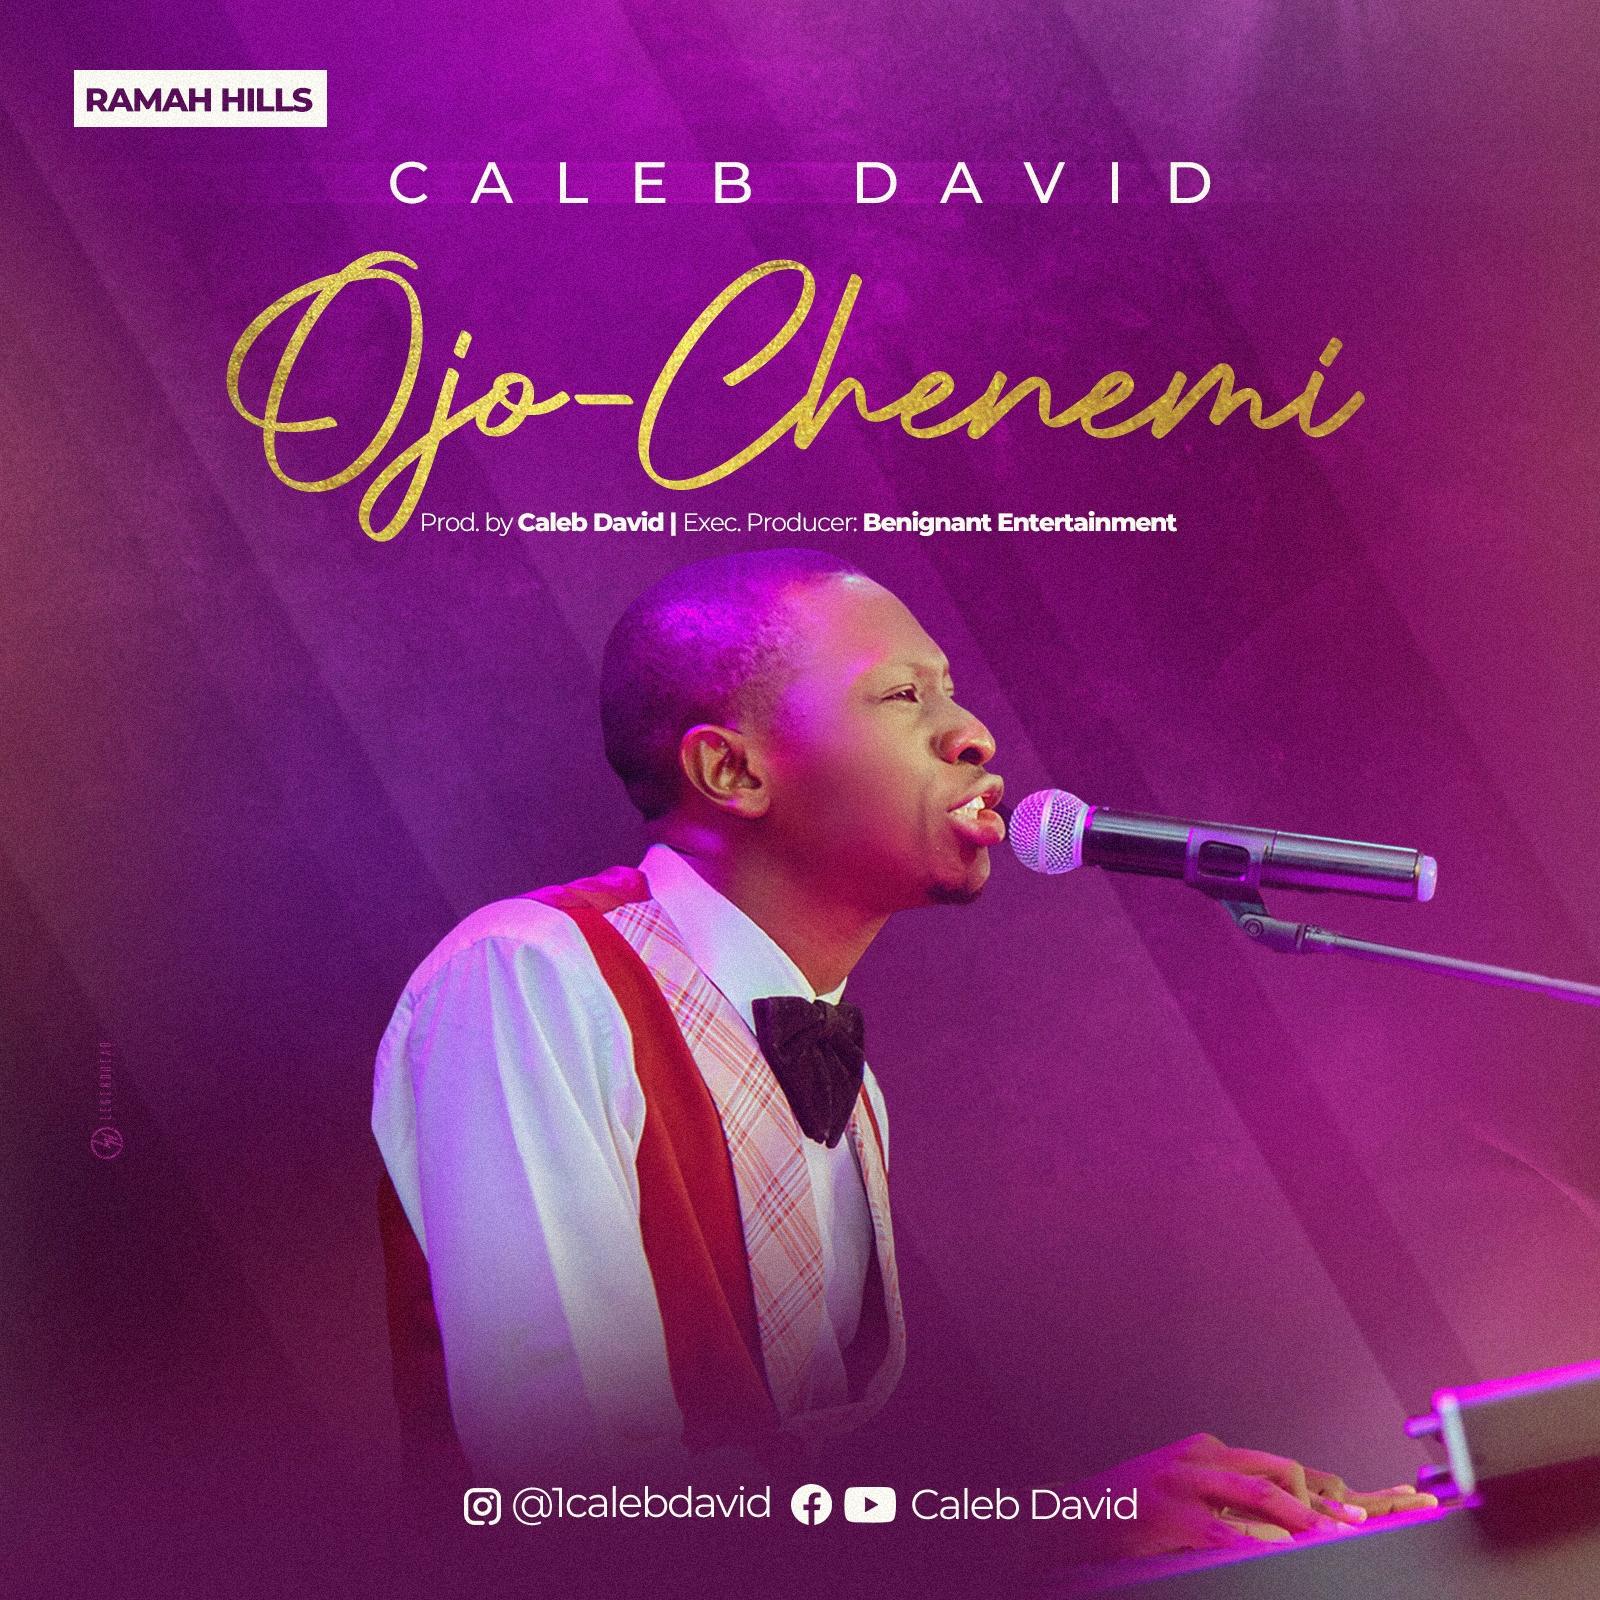 DOWNLOAD Music: Caleb David - Ojo Chenemi - Kingdomflavour.com